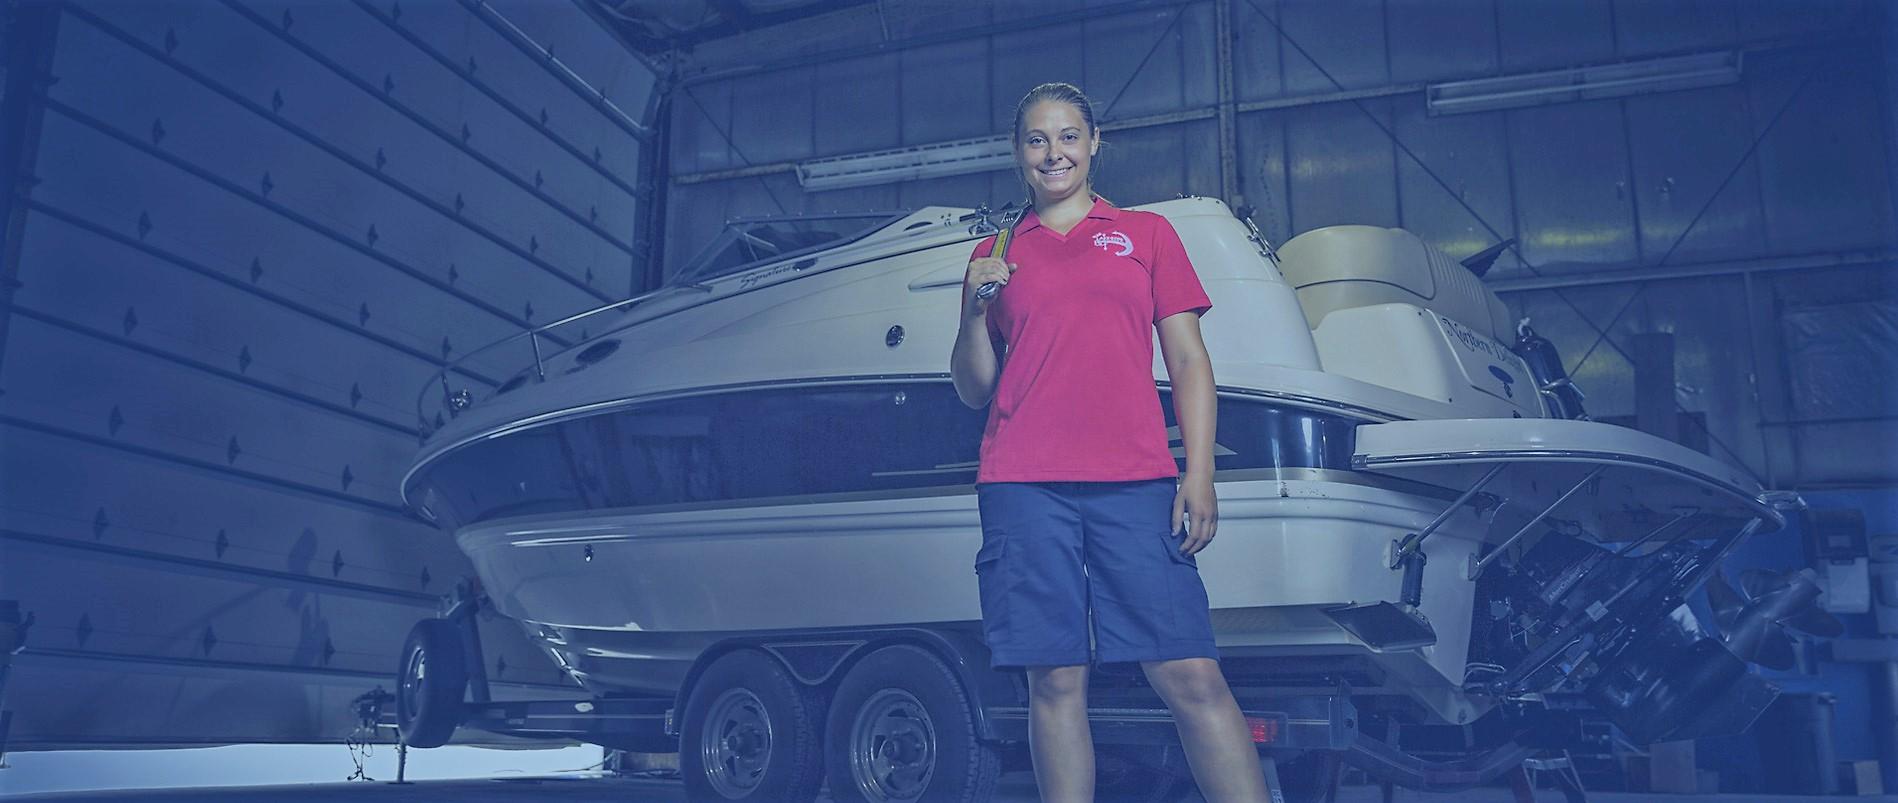 mass boating careers